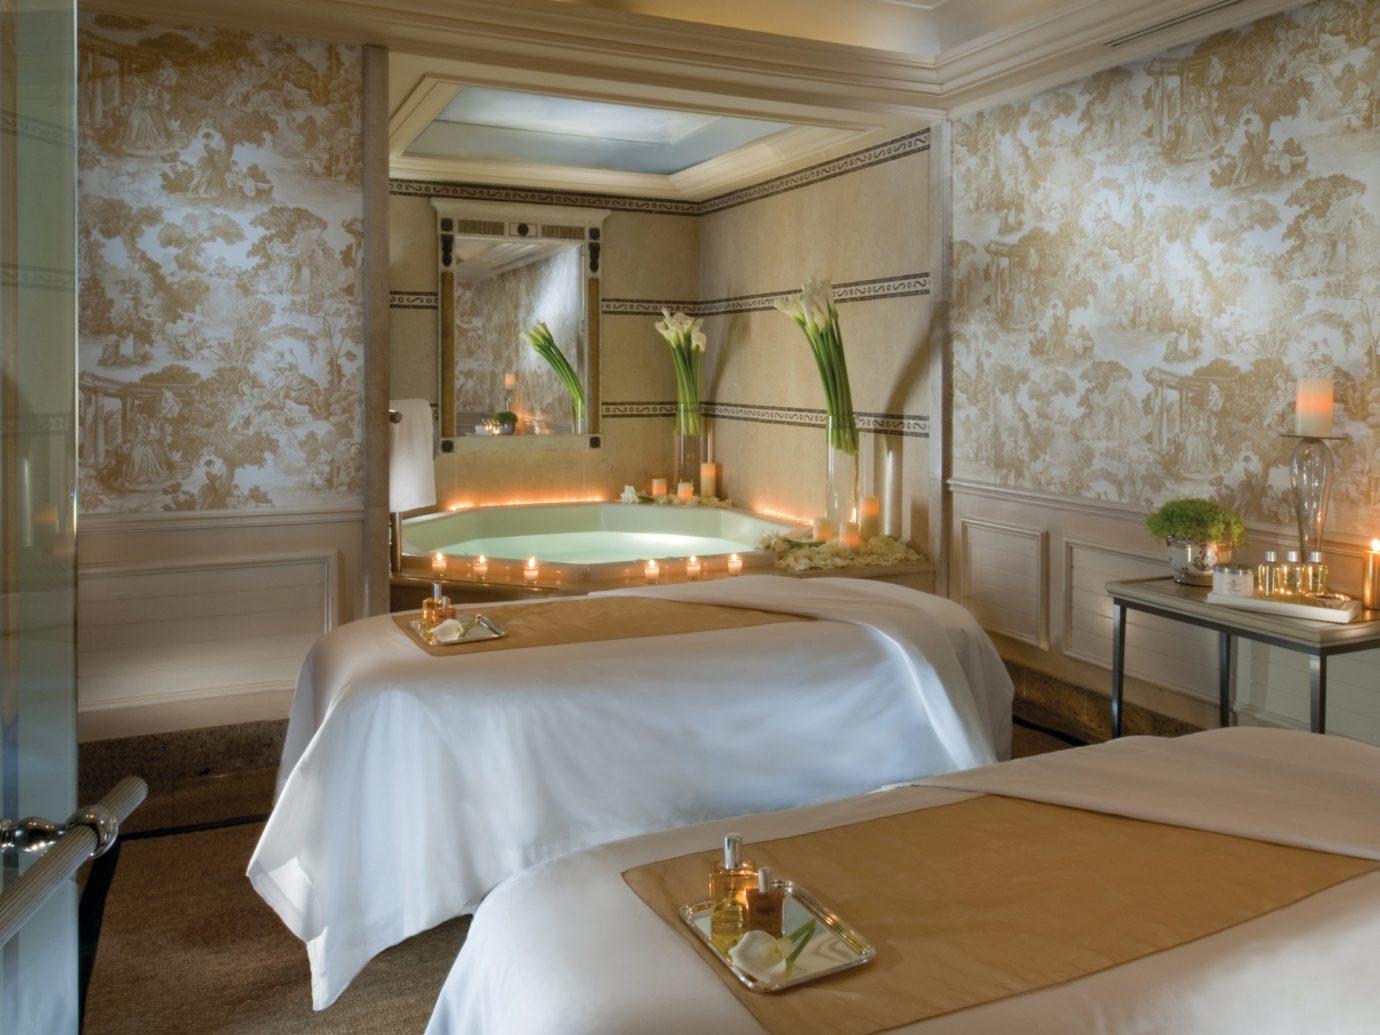 Health + Wellness Hotels Spa Retreats indoor wall room property Bedroom Suite estate interior design cottage